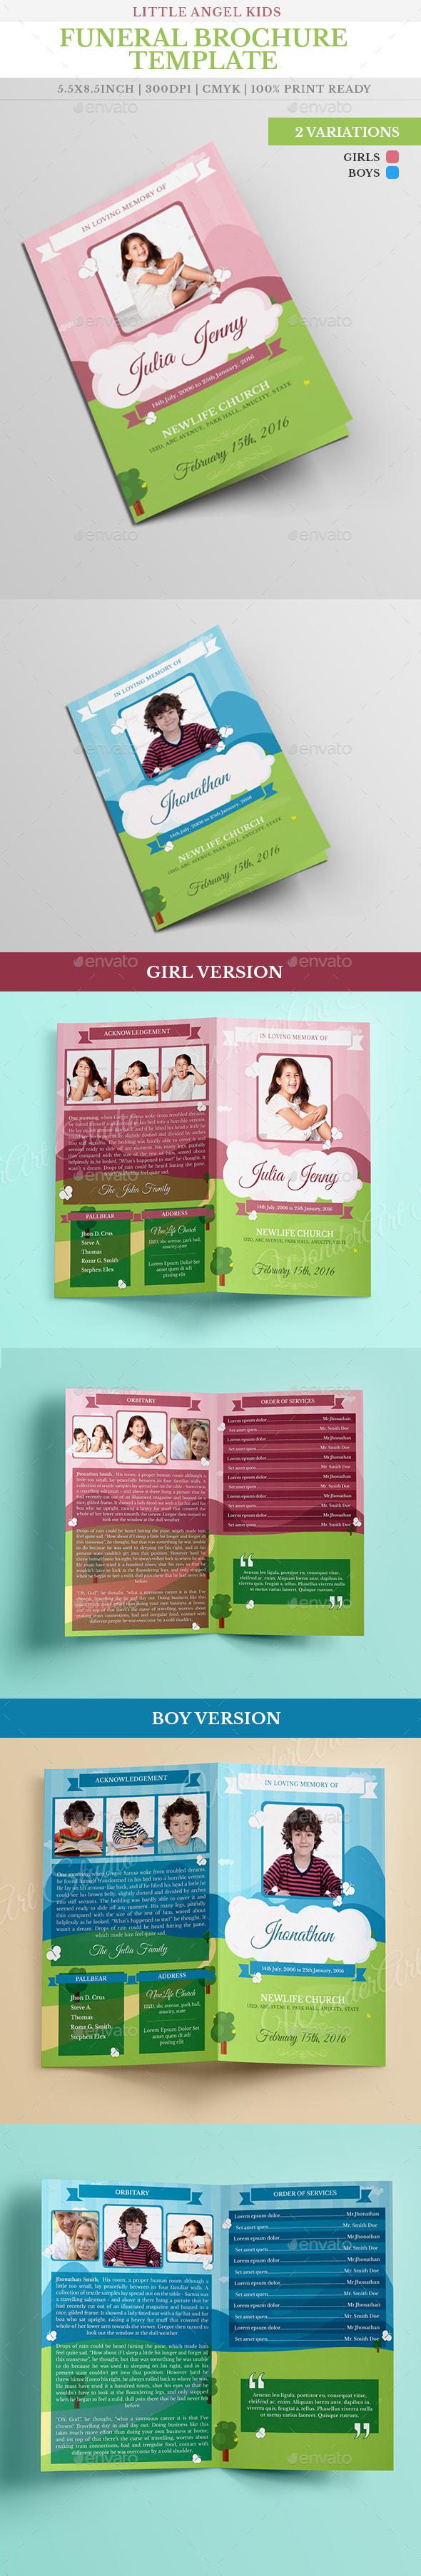 Little Angel Boy Girl Kid Funeral Brochure Template - Brochures Print Templates